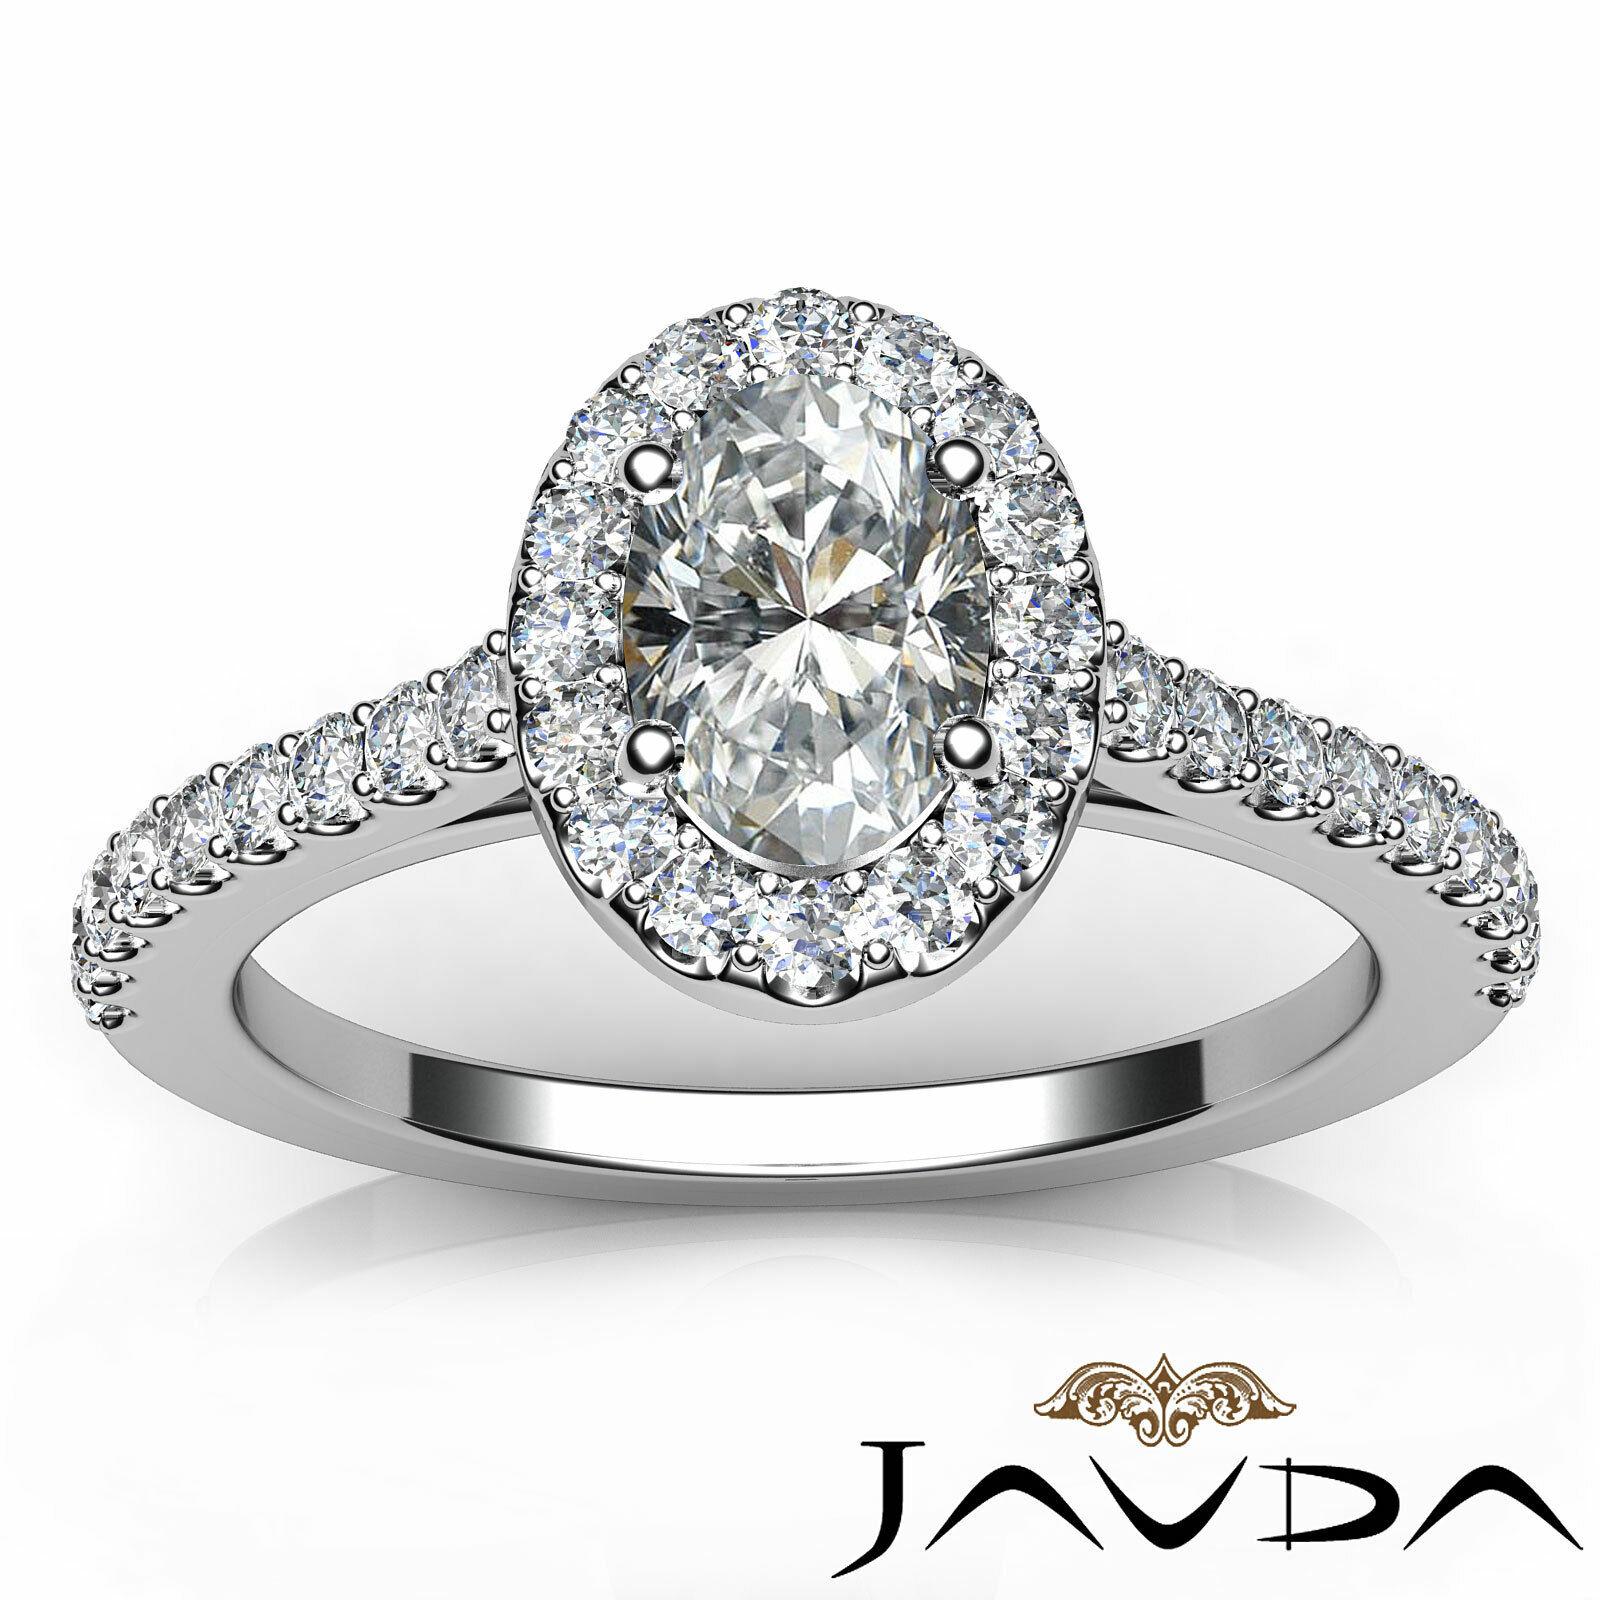 1.6ctw Prong Setting Oval Diamond Engagement Ring GIA H-VS1 White Gold Women New 3